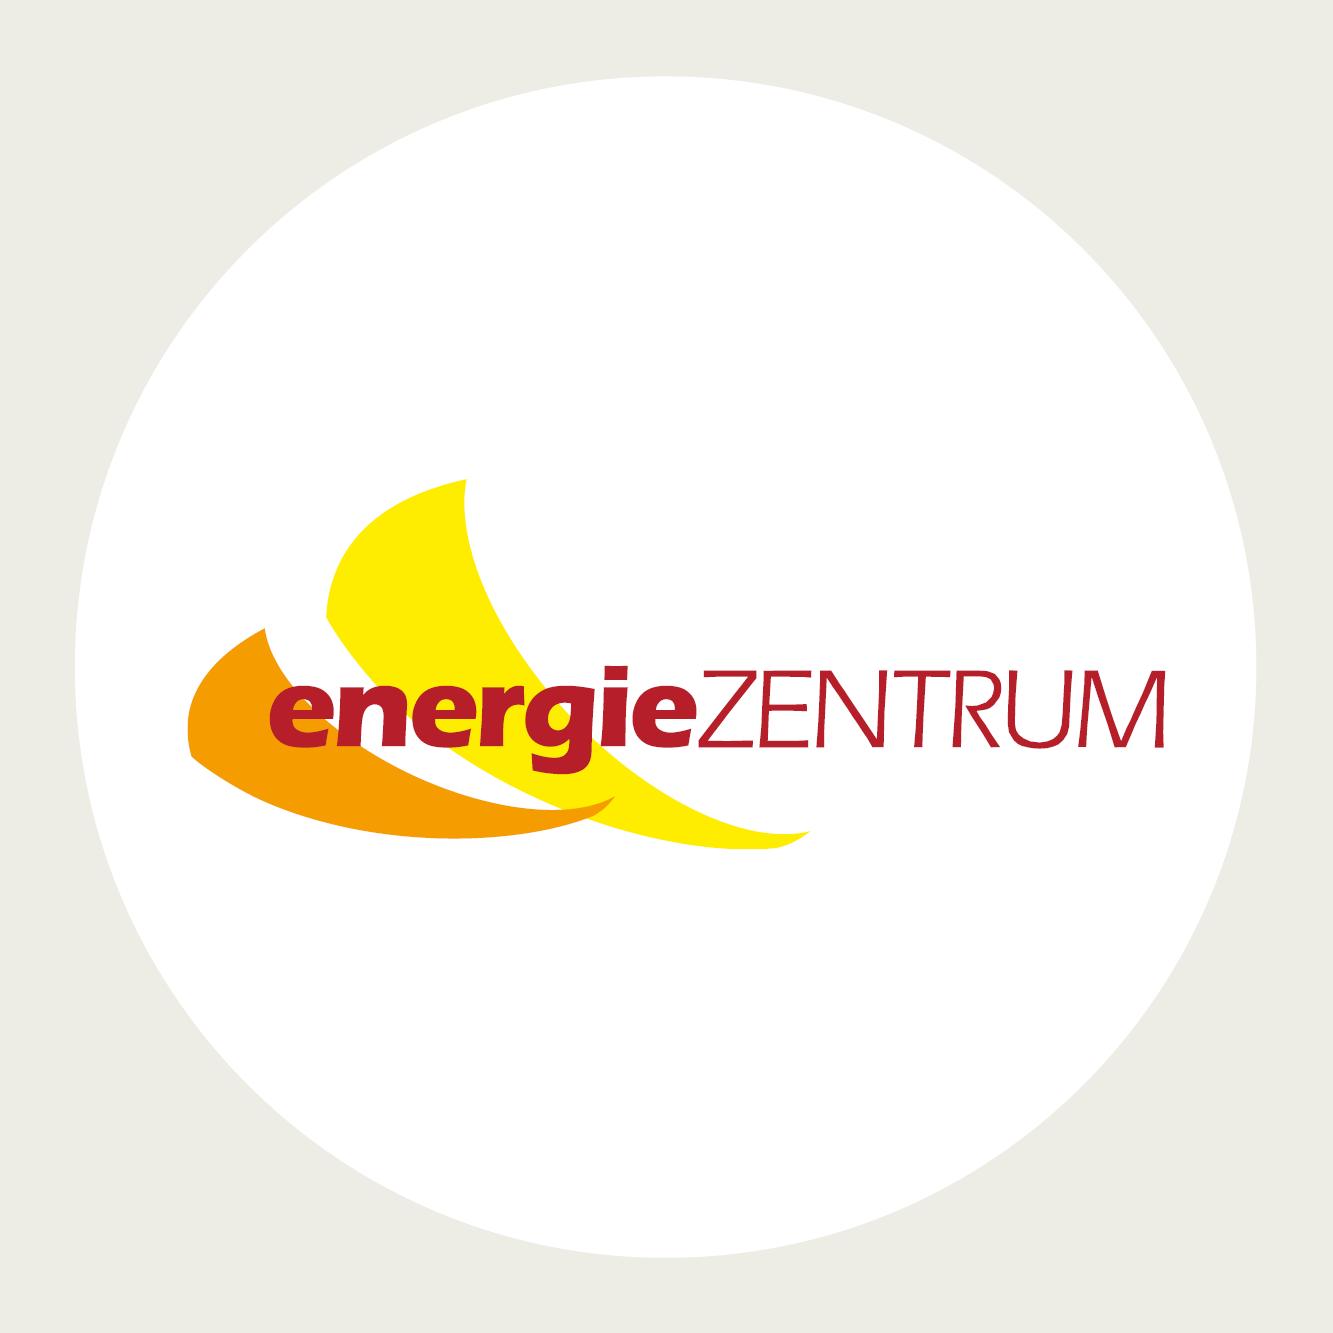 2004 Erstes Logo energieZENTRUM